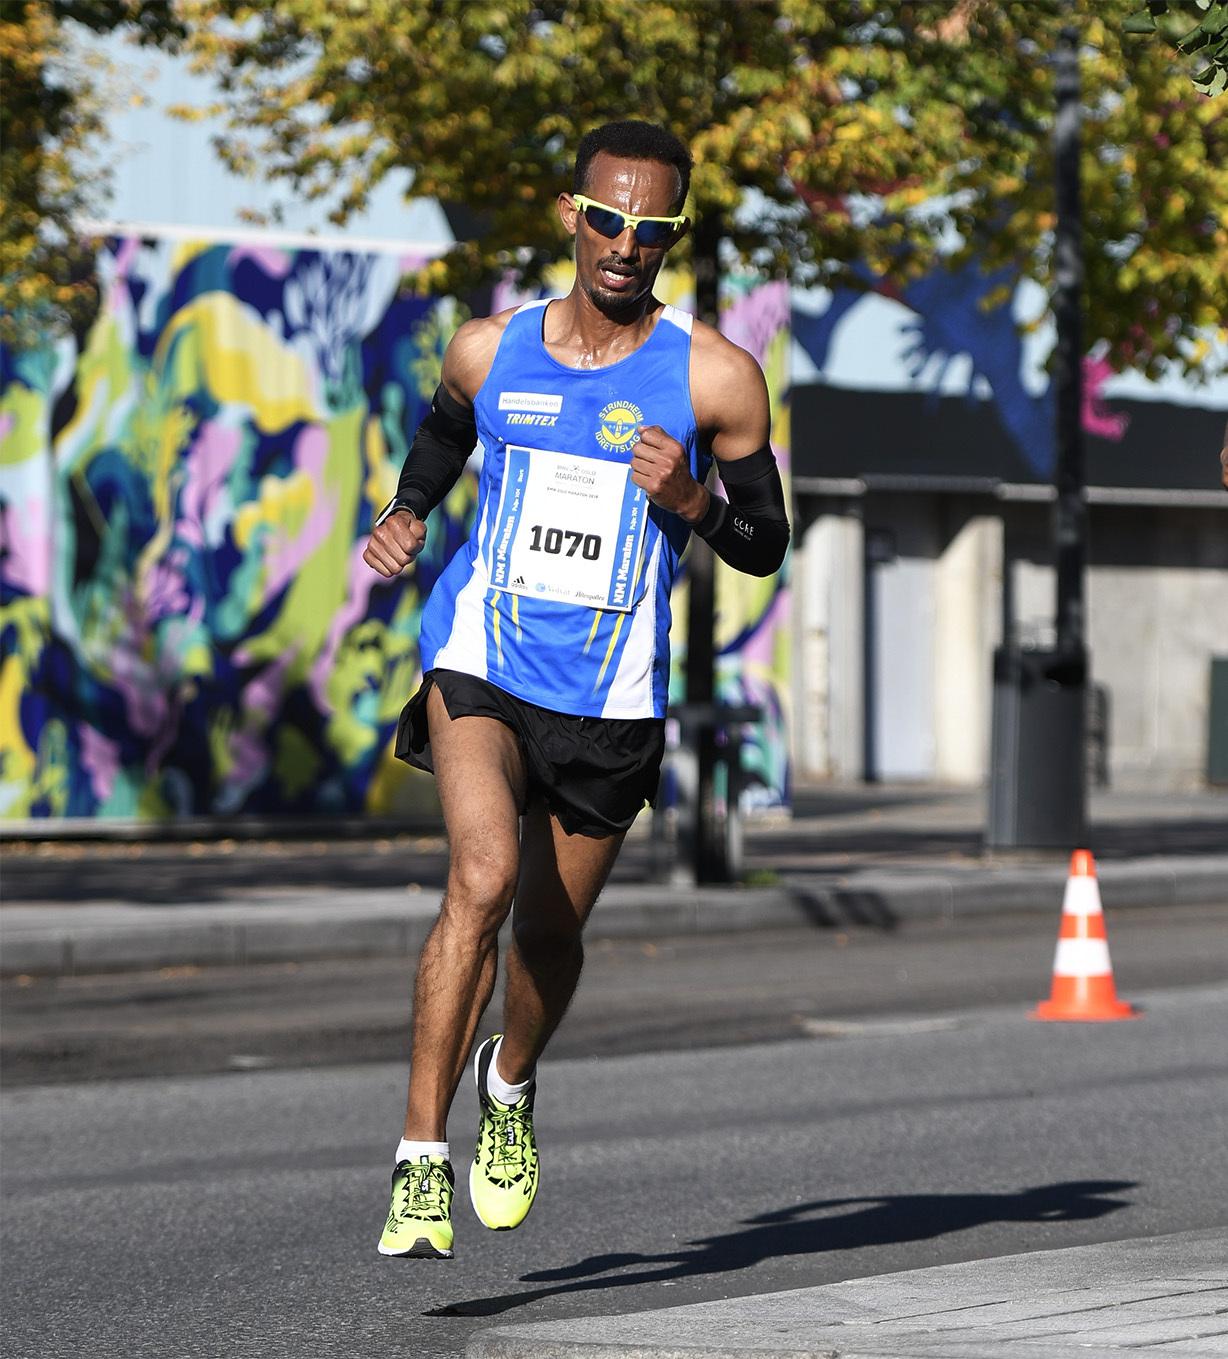 Ebrahim_Abdulaziz_Oslo-Maraton_2018_foto_Bjoern_Johannessen.jpg